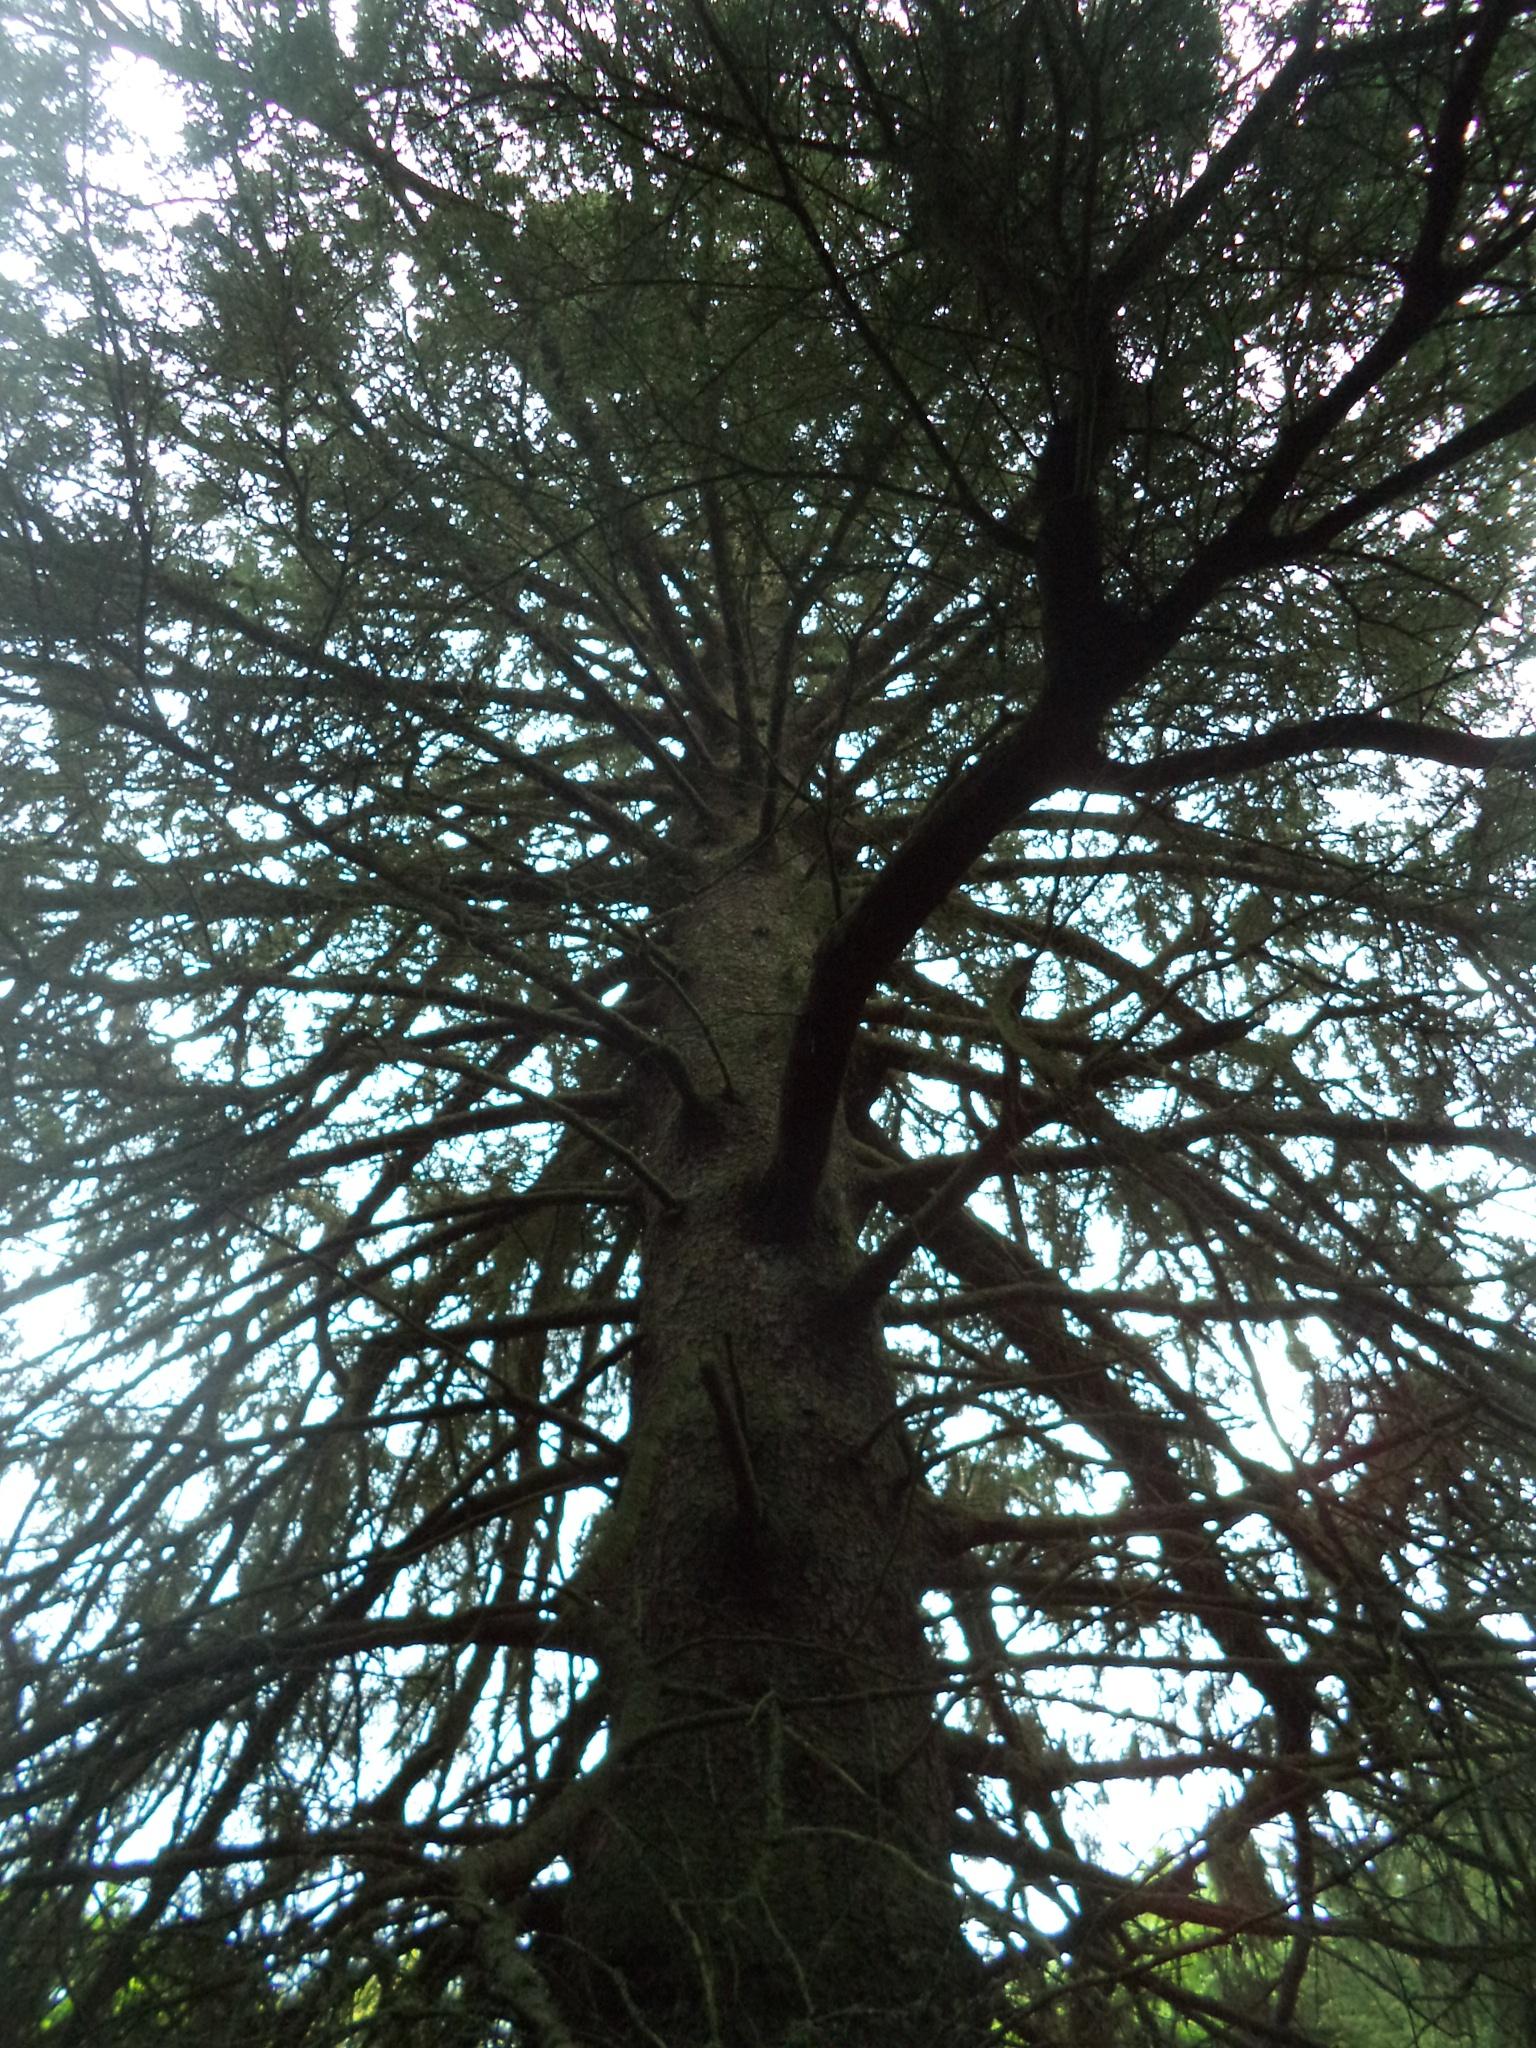 Epic Tree #thebiggestIeverseen by Carlo McNicholl